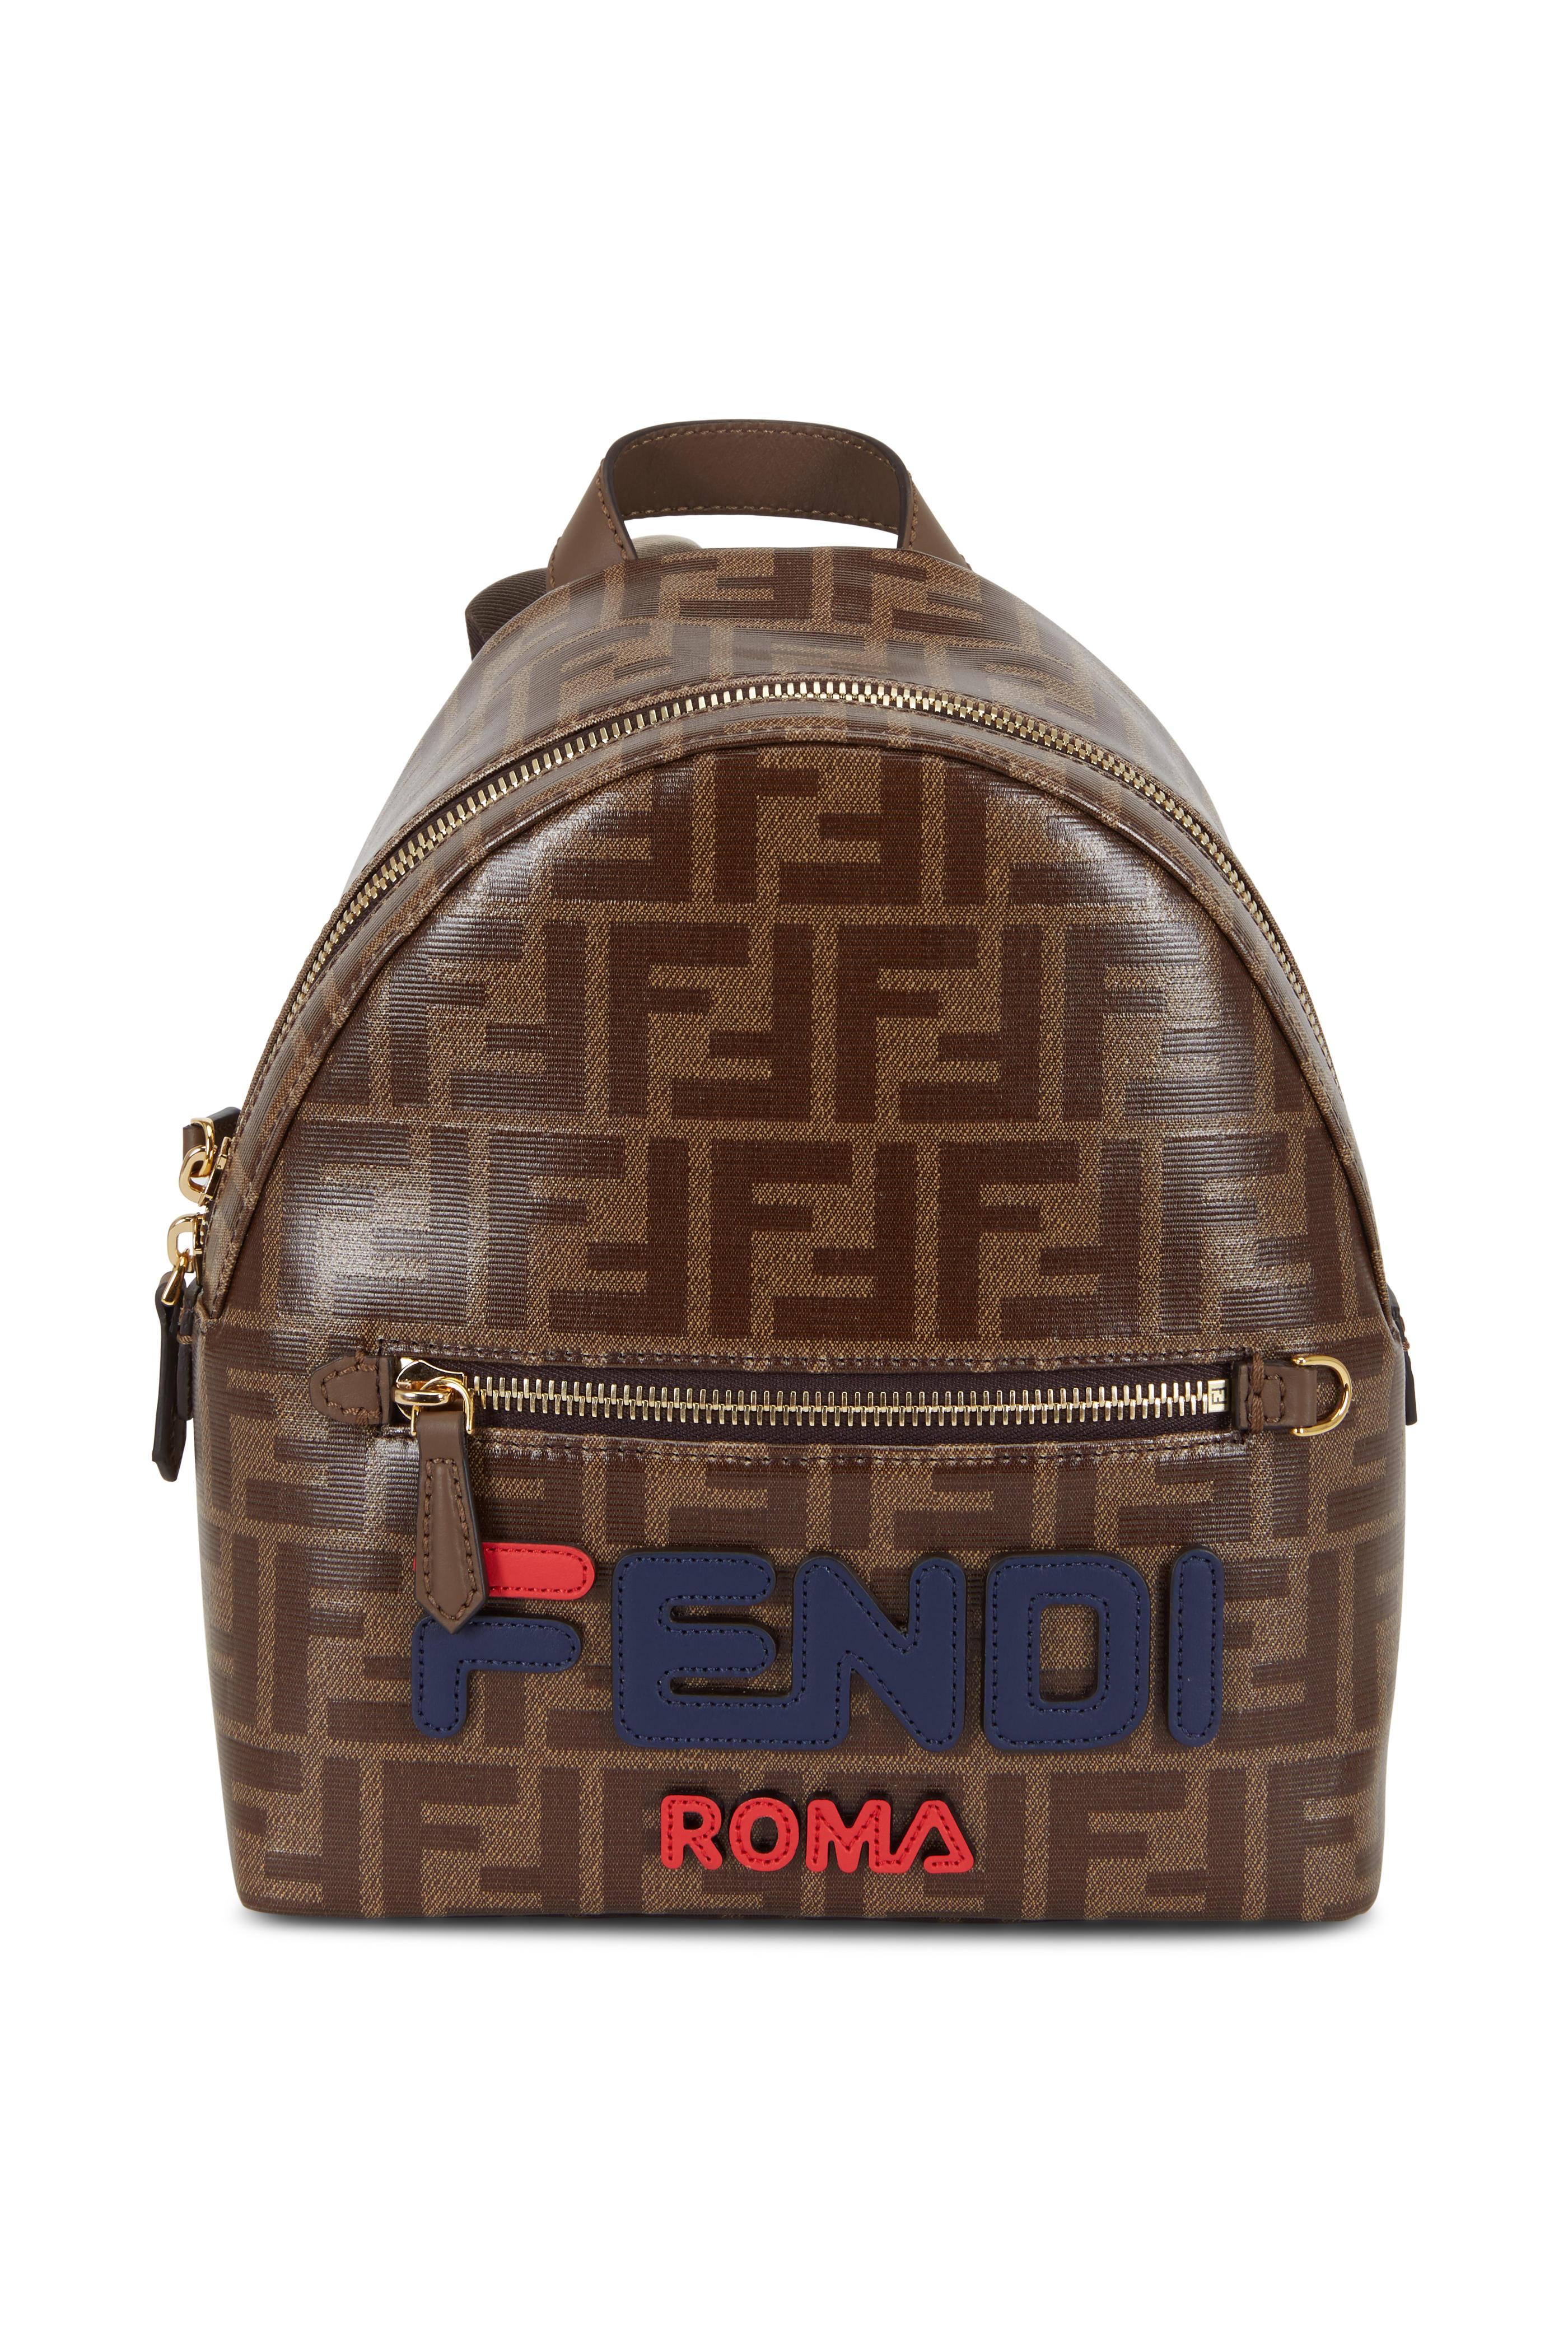 42b0e579d Fendi - Brown Coated Canvas Mania Logo Mini Backpack | Mitchell Stores